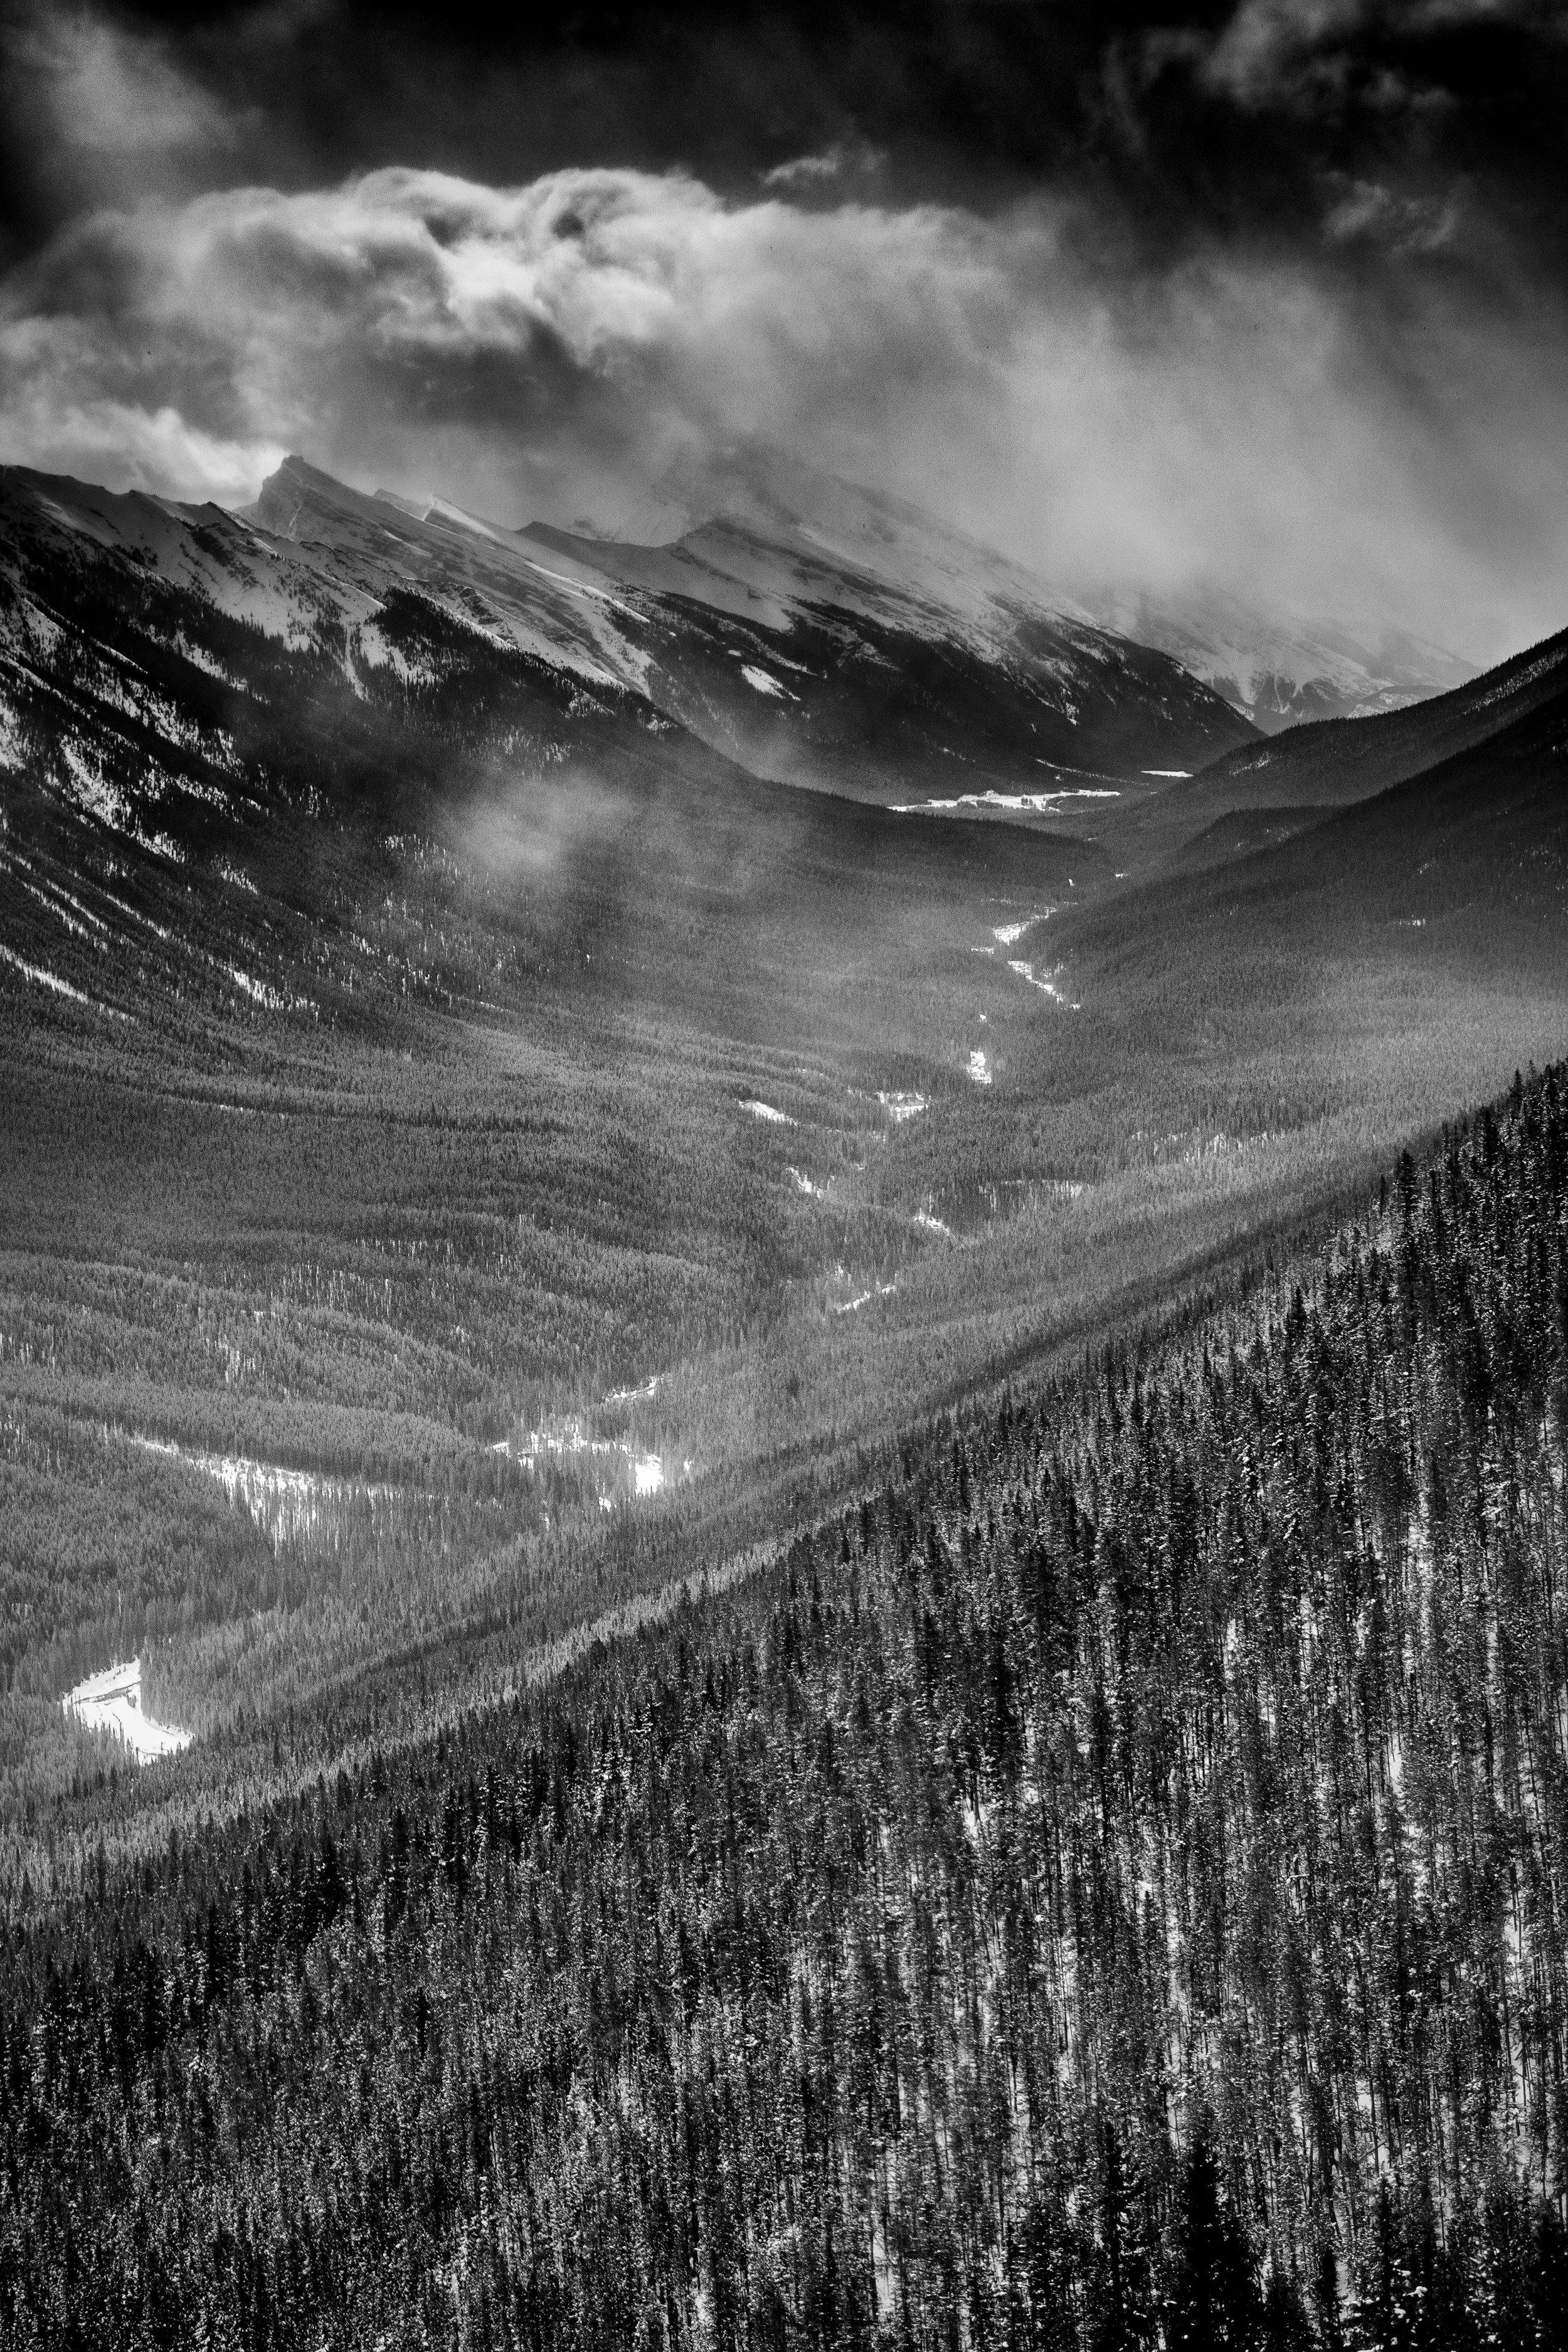 From Sulphur Mountain.